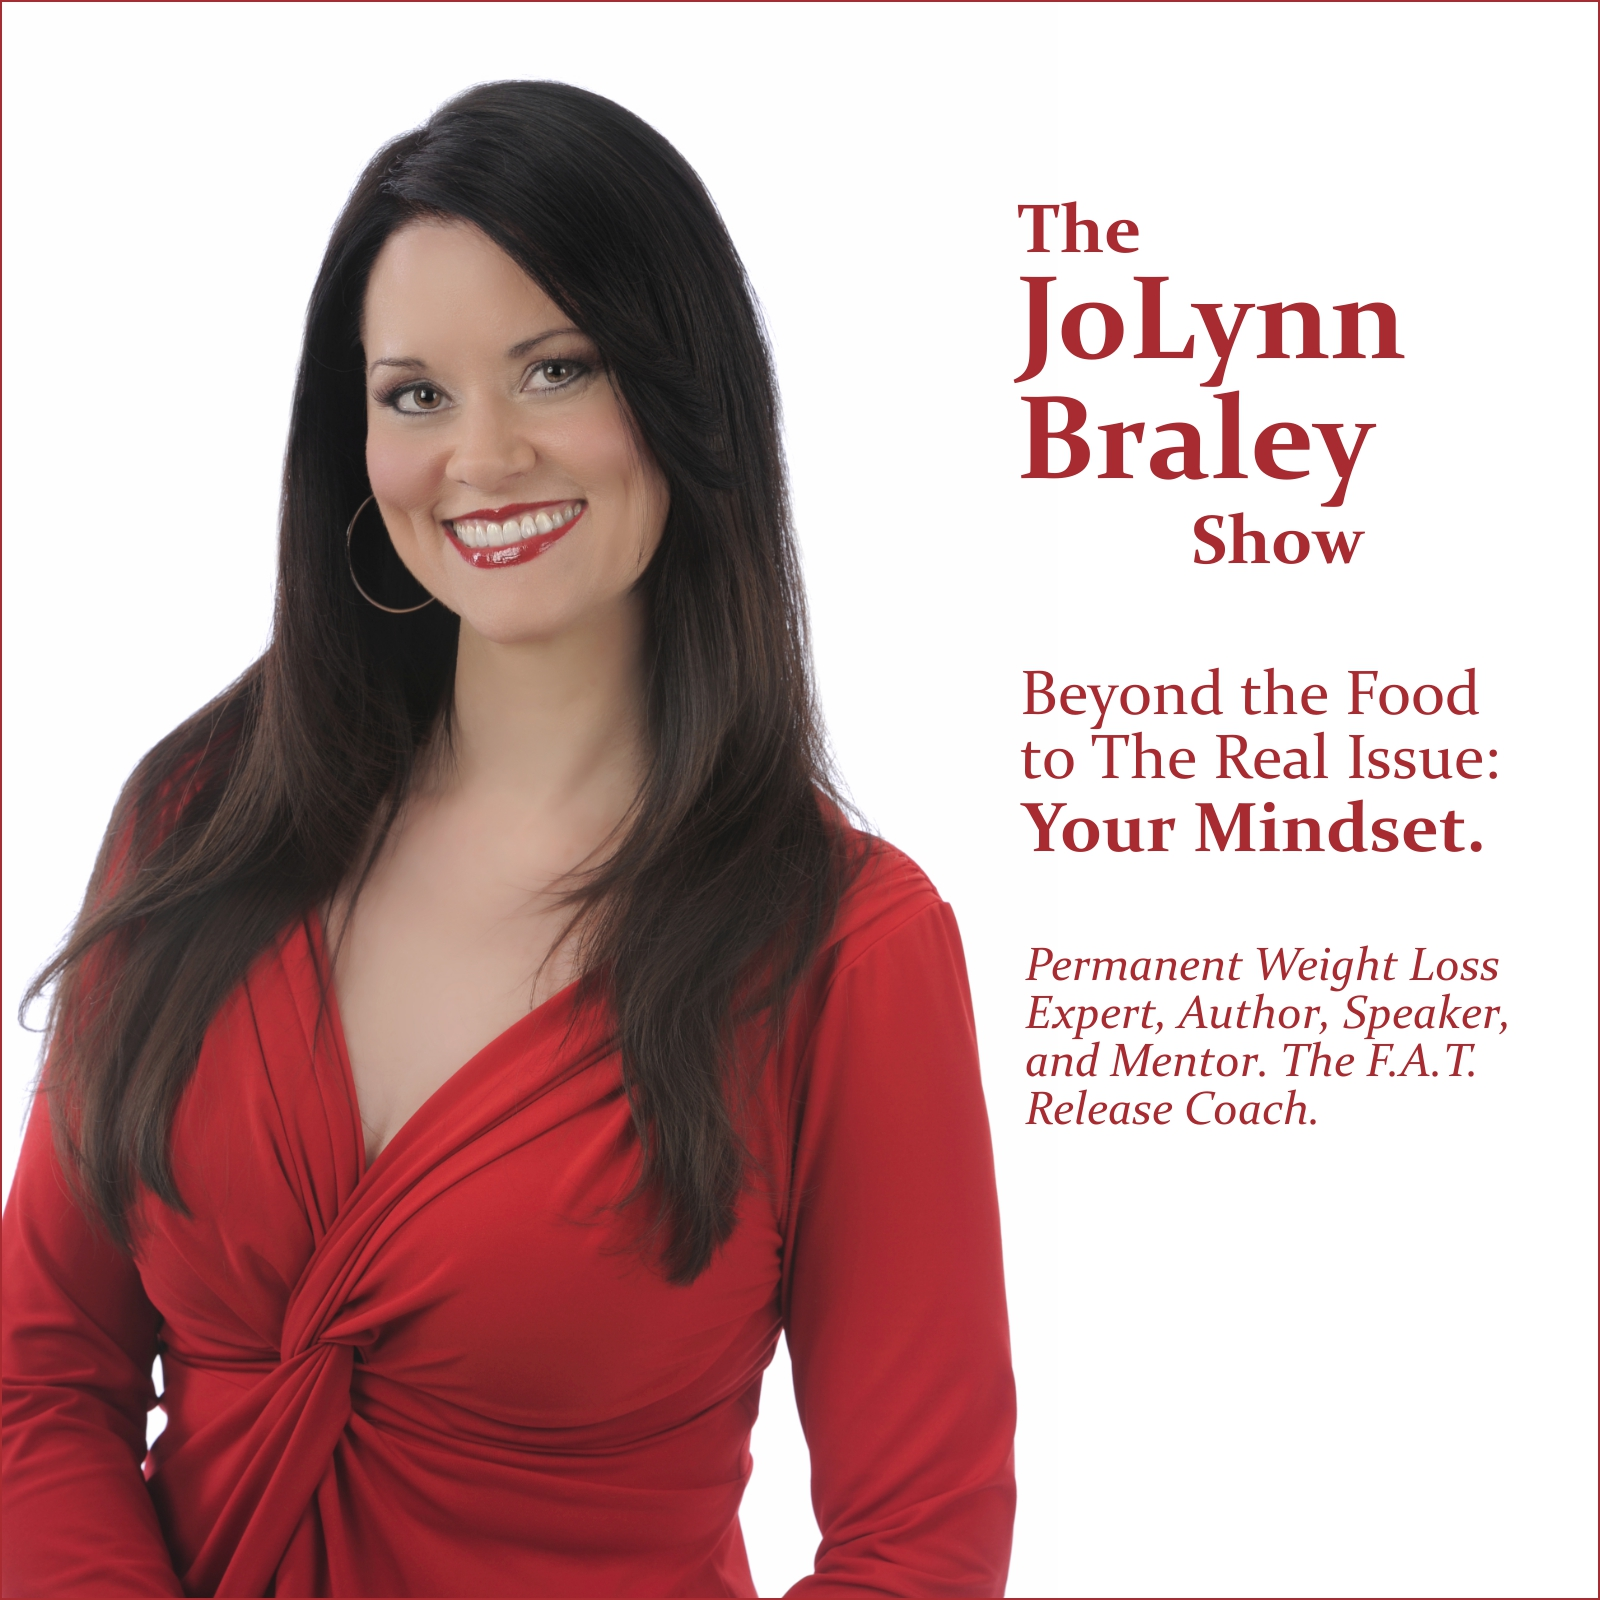 The JoLynn Braley Show